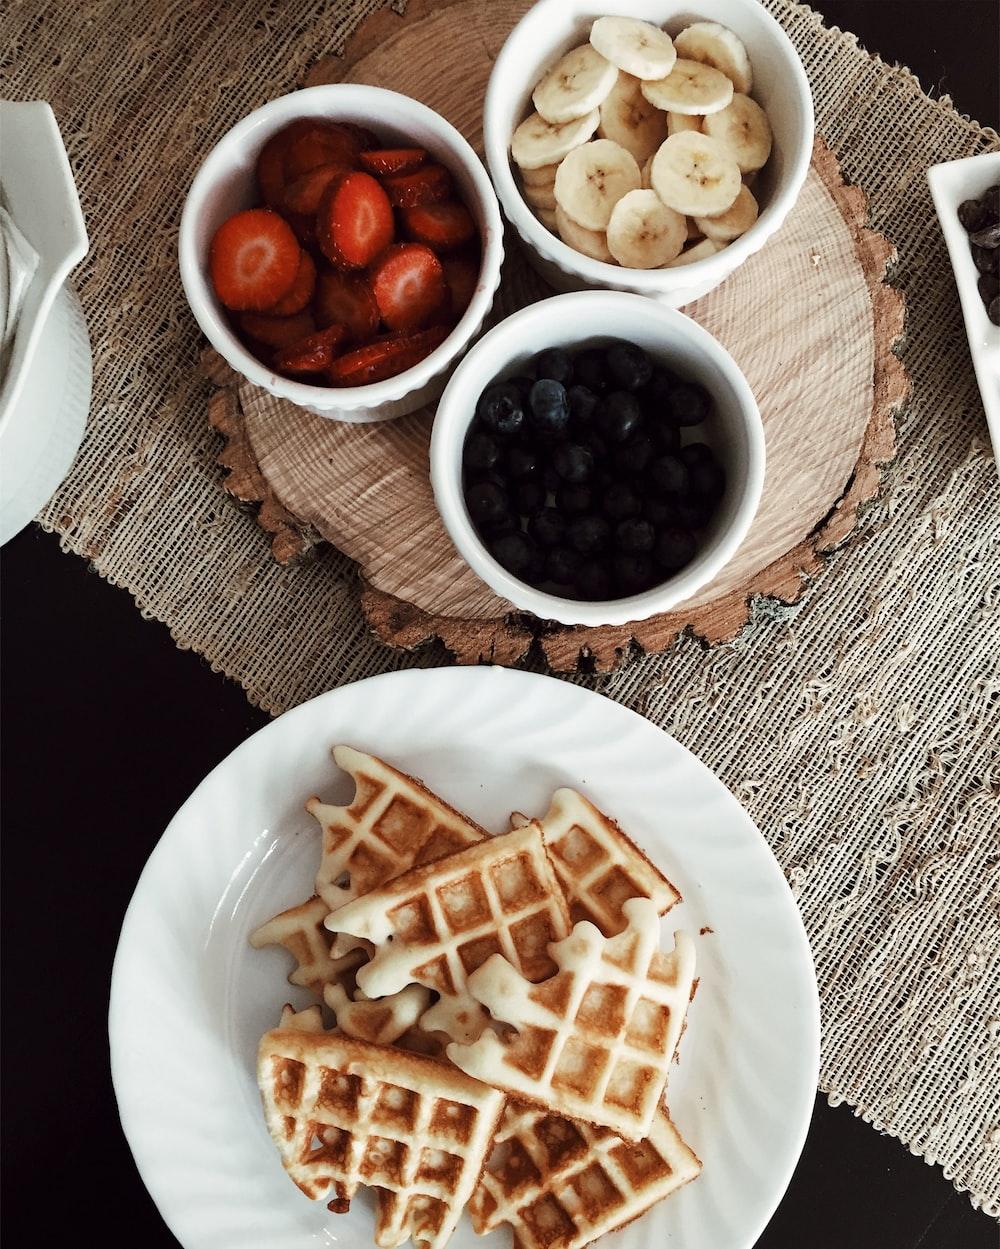 photo of waffles beside bowls of strawberries, banana, and black berries